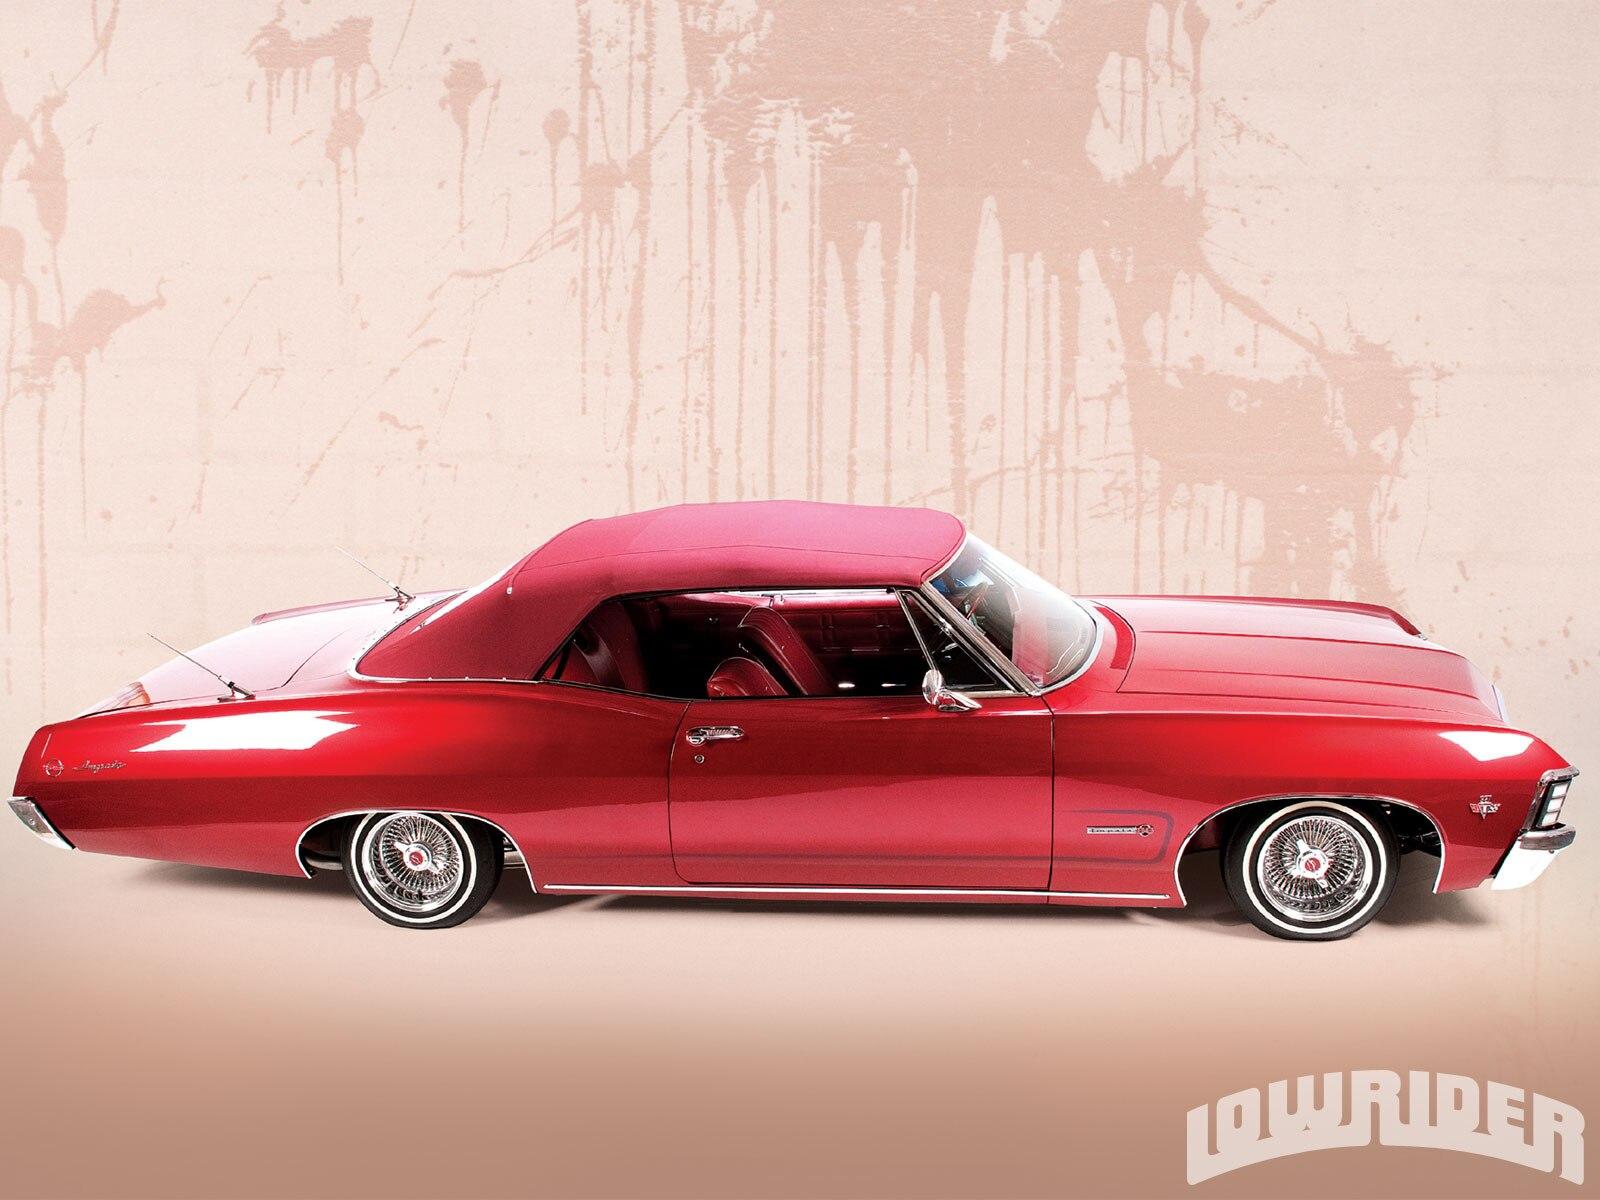 1967 Chevrolet Impala Lowrider Magazine